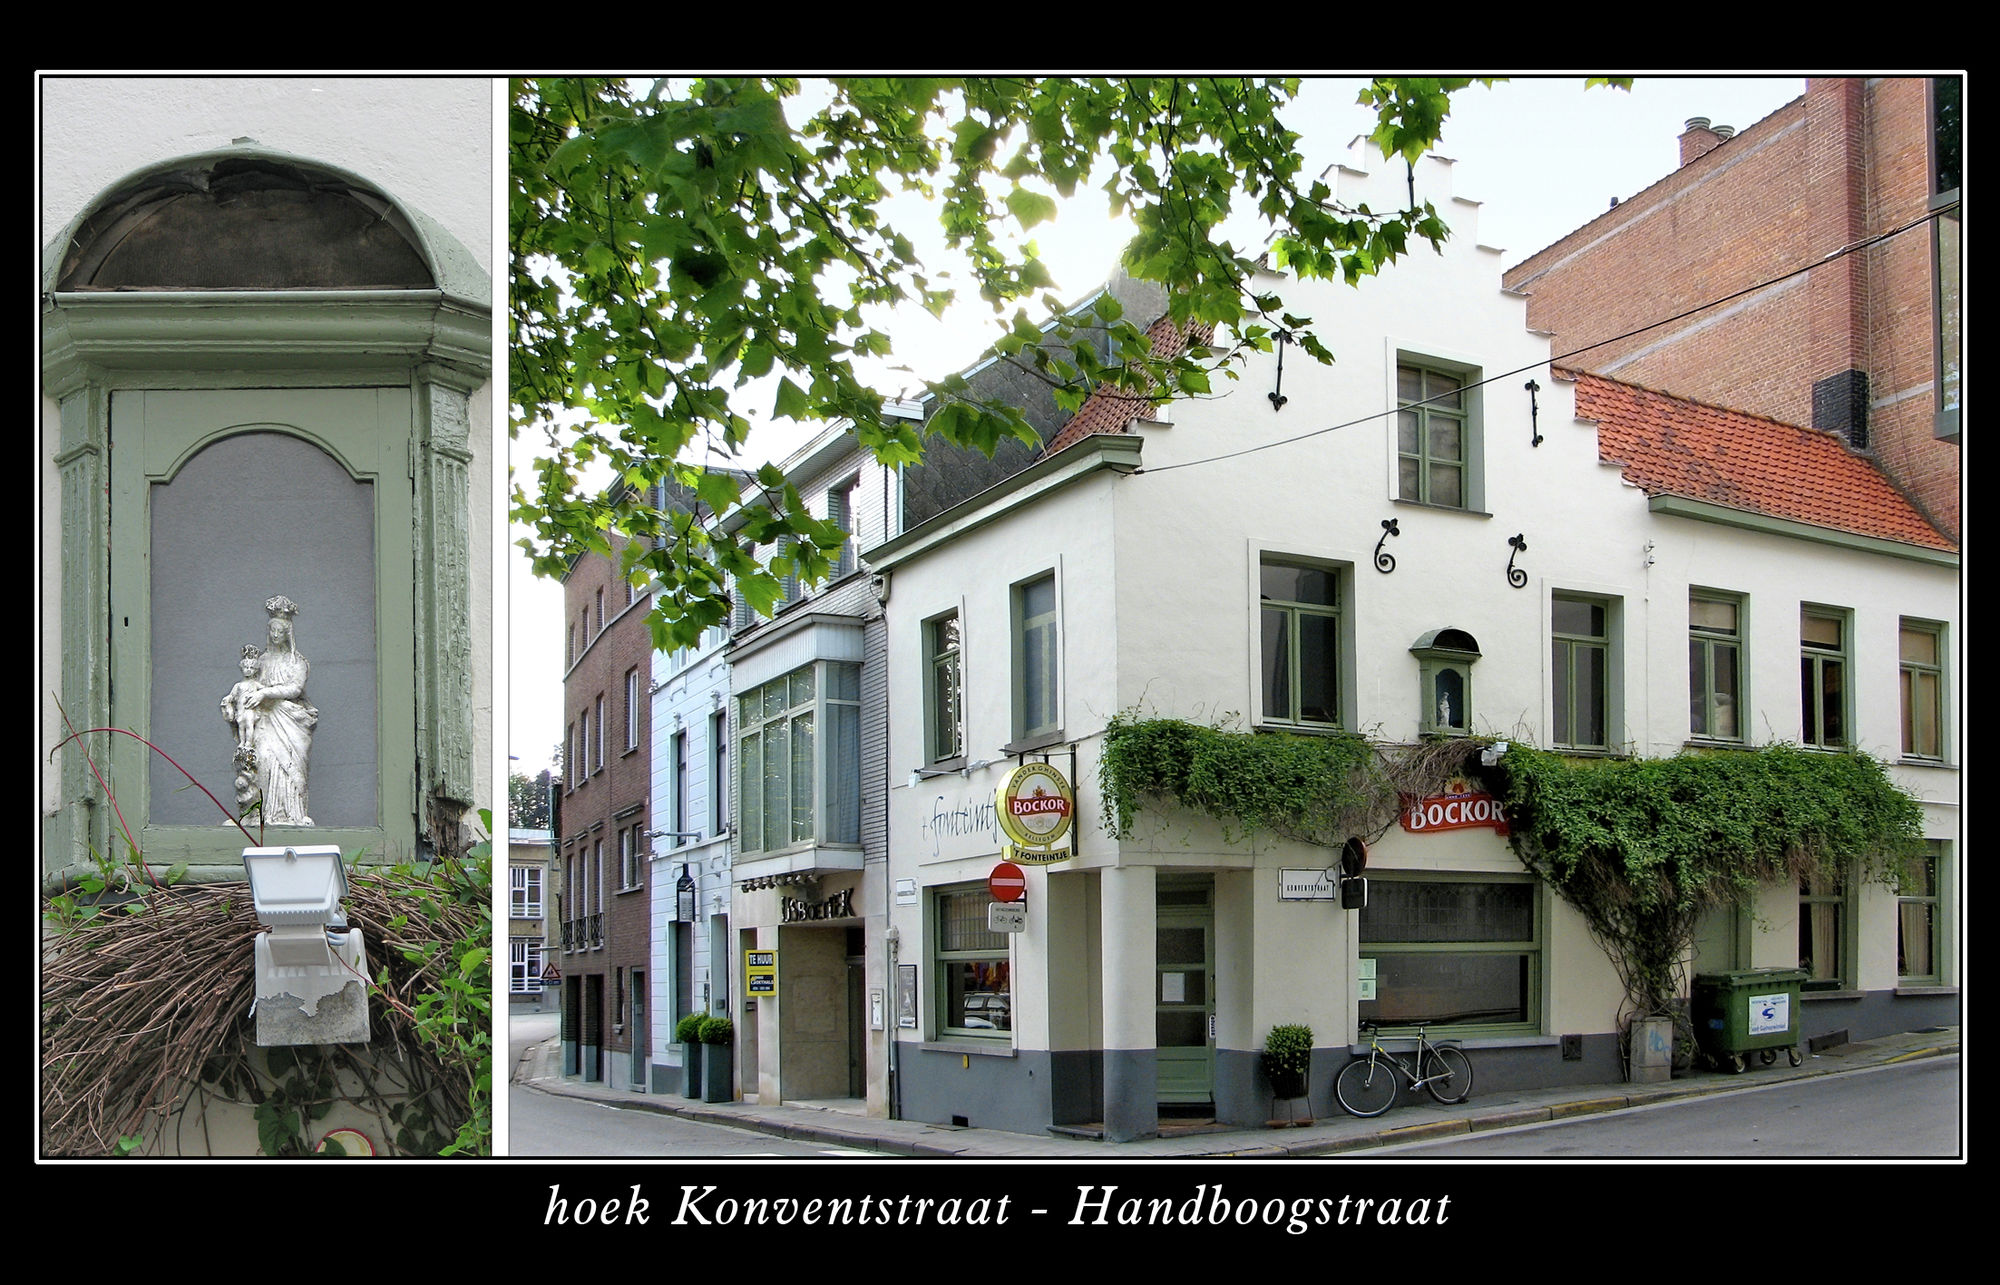 Muurkapel hoek Konventstraat-Handboogstraat